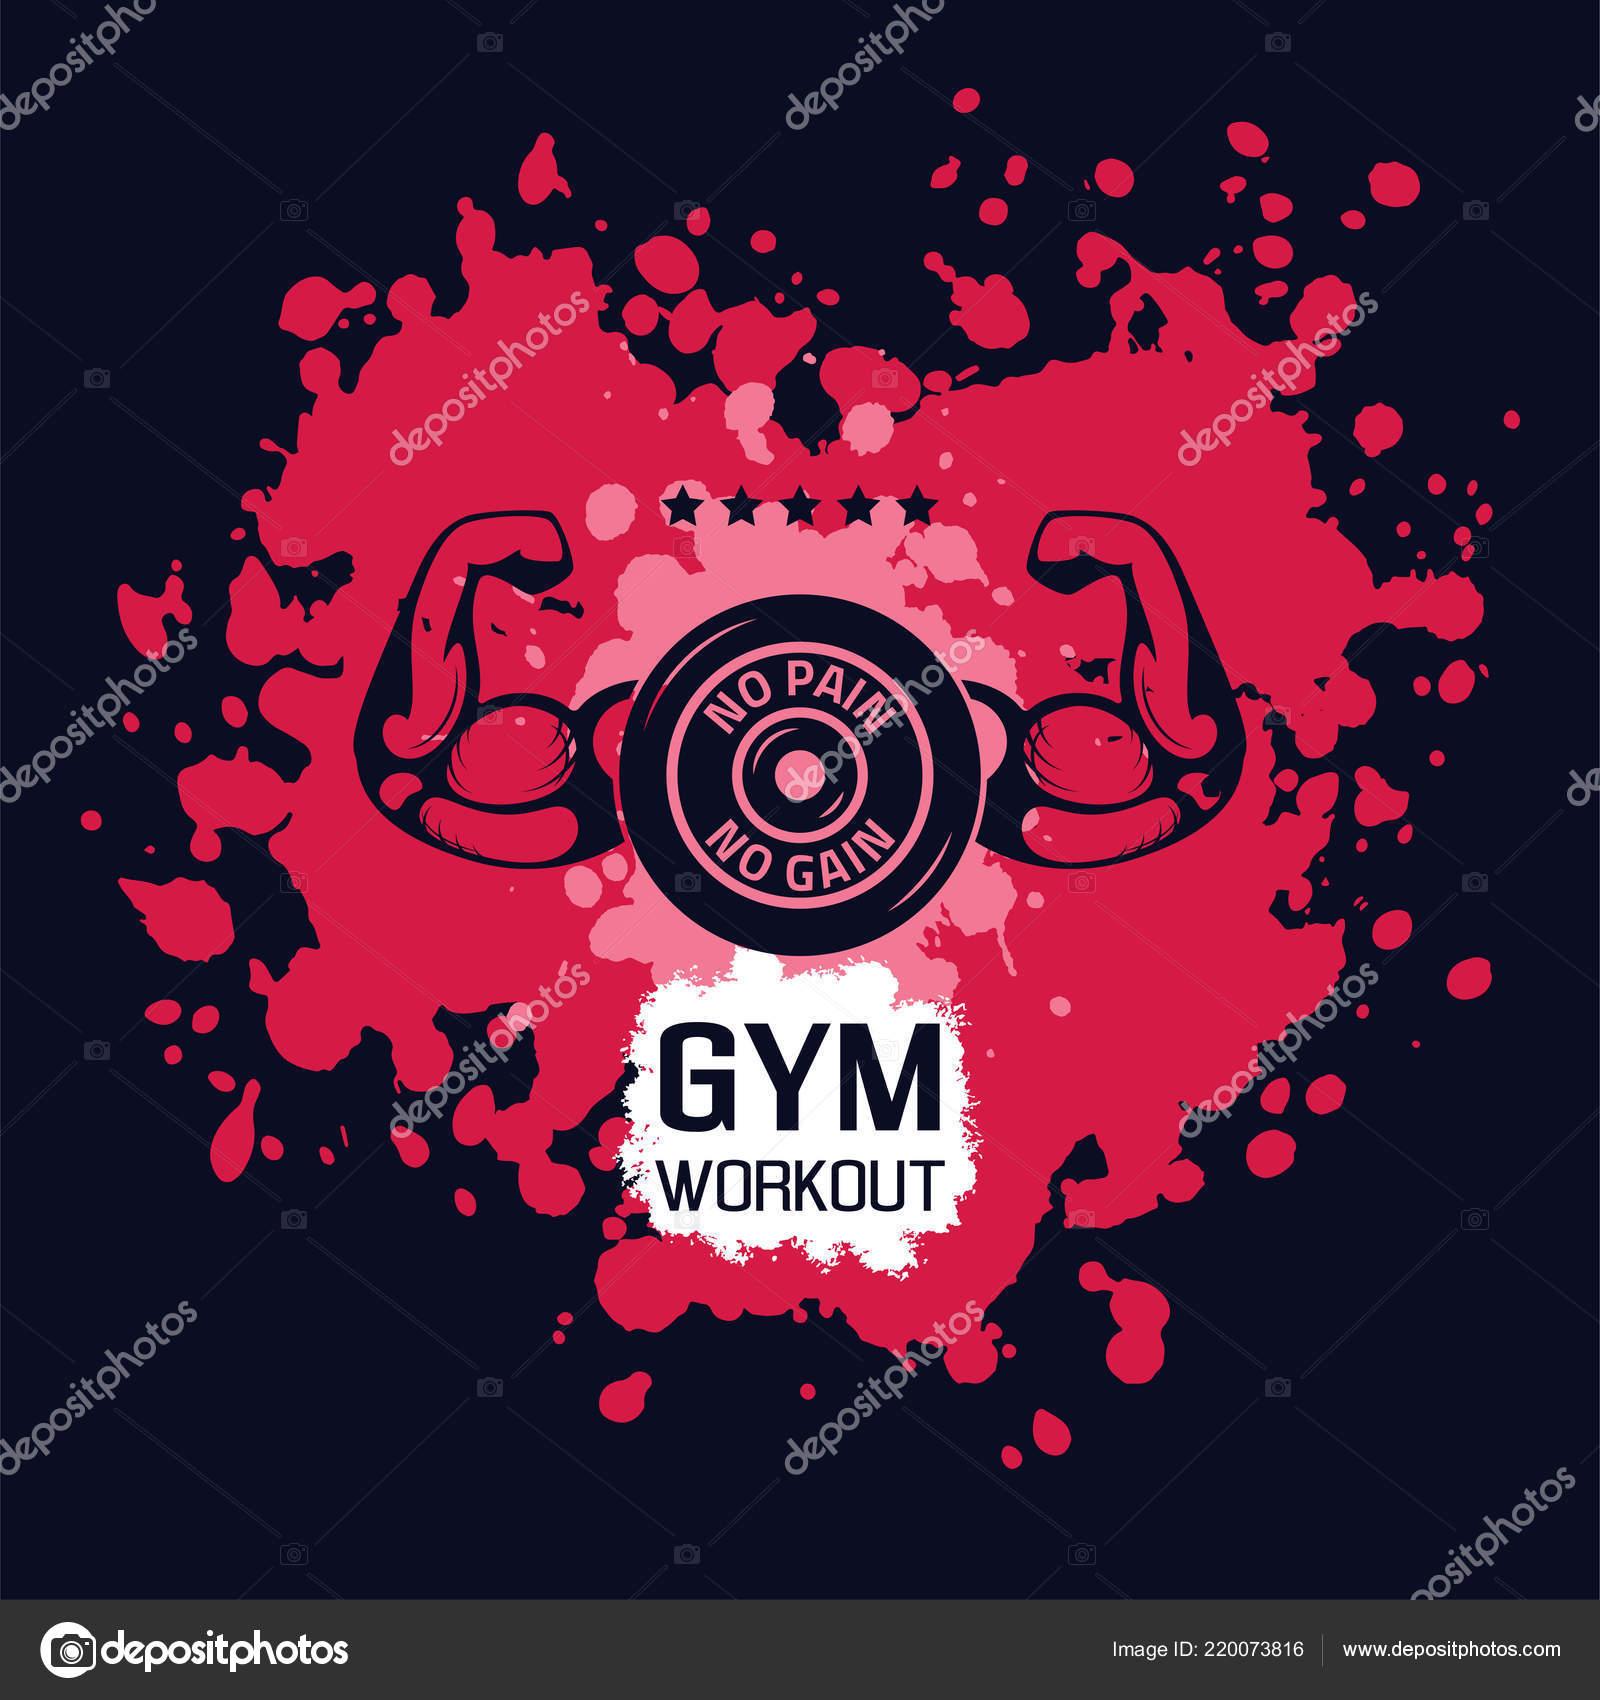 No Pain No Gain Wallpaper Bodybuilding No Pain No Gain Stock